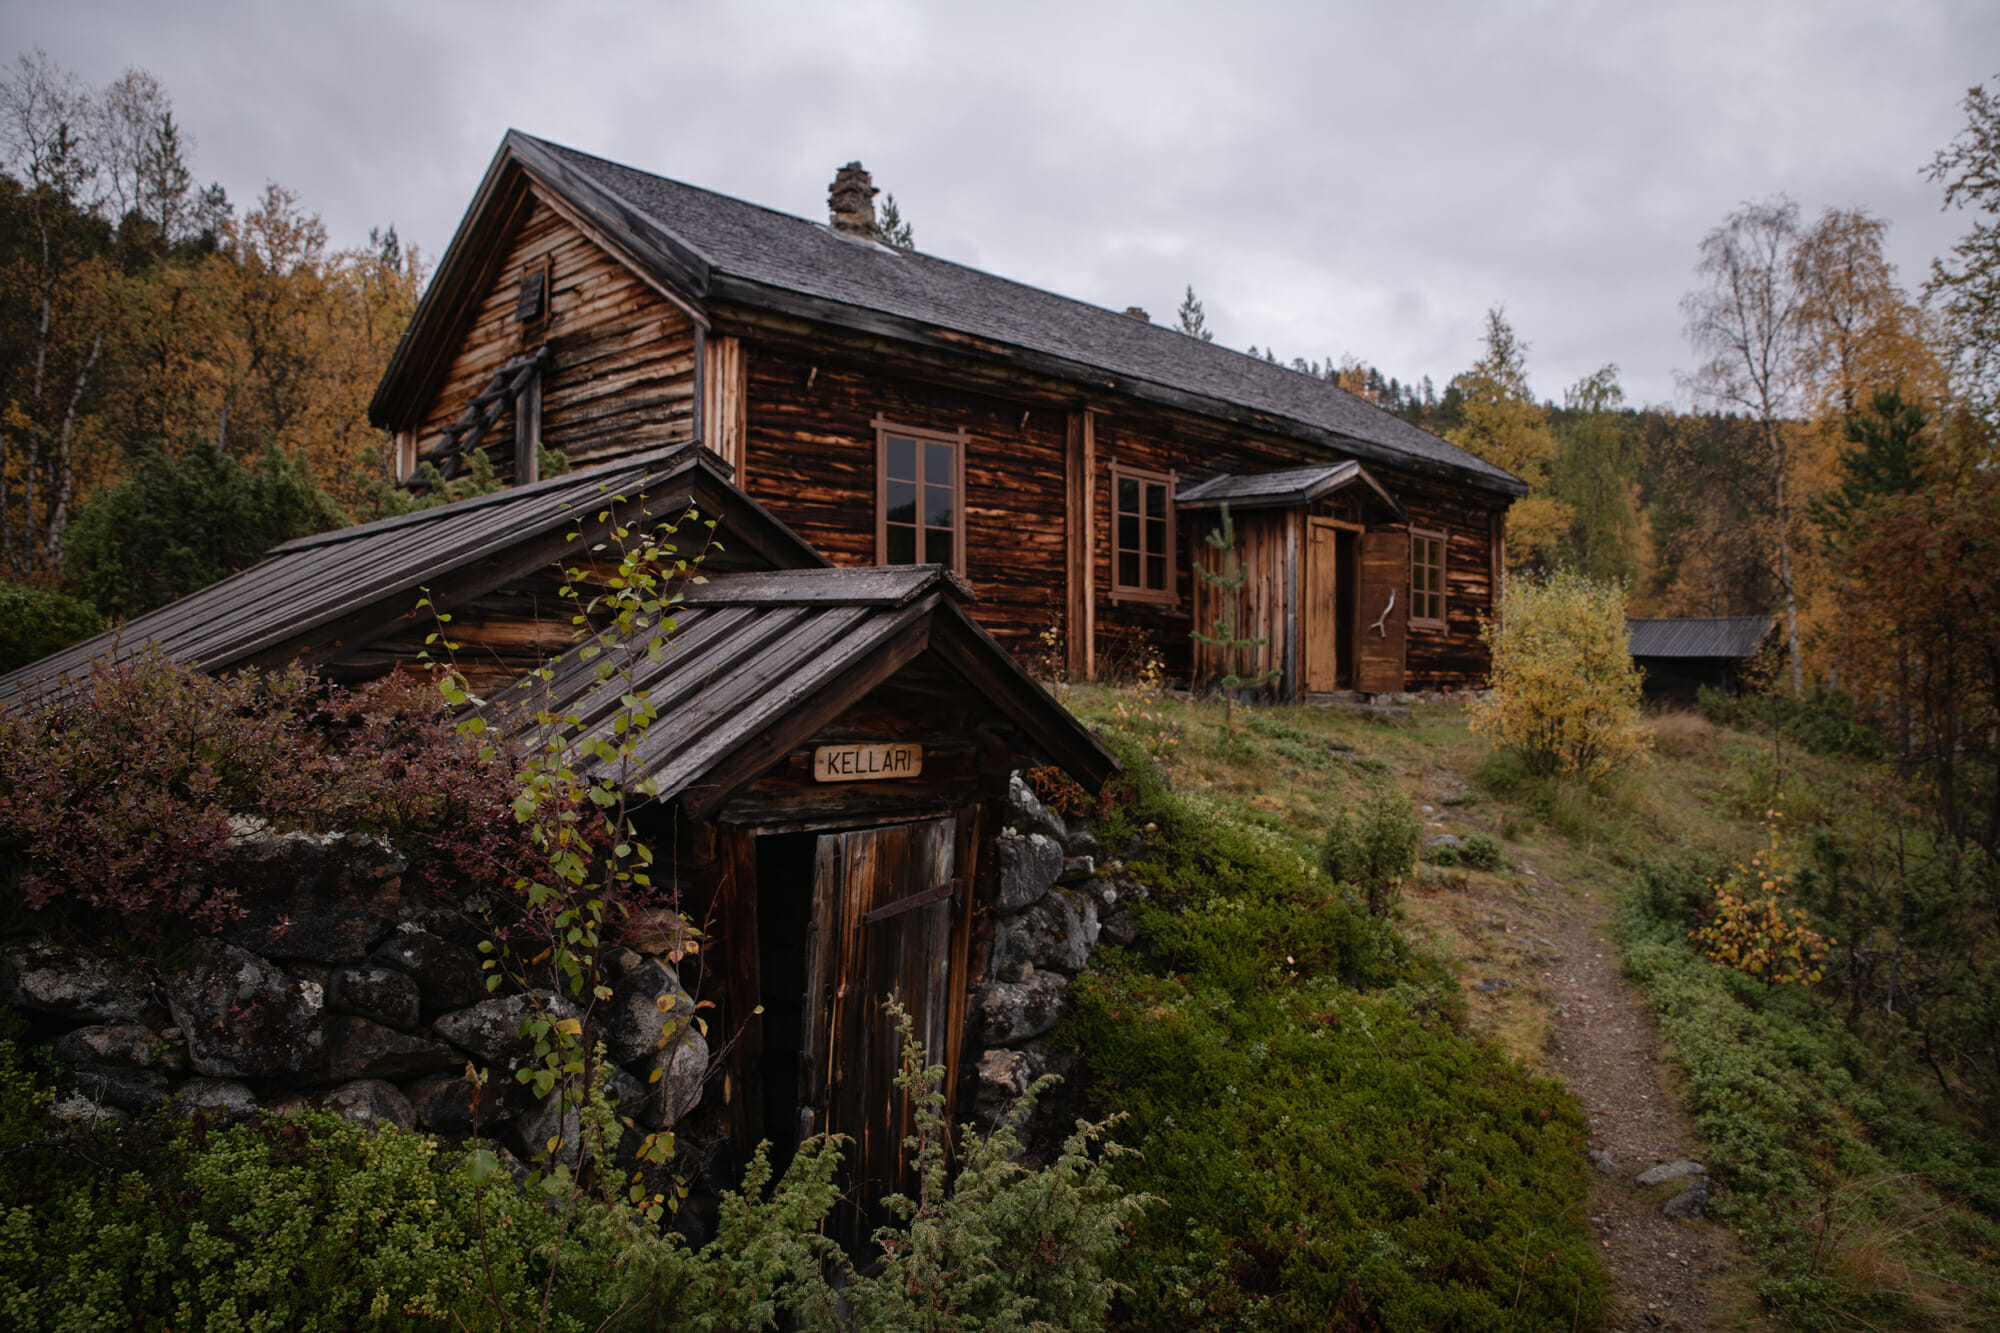 Kultala, Ivalojoki en Packraft, Laponie finlandaise, Zone sauvage d'Hammastunturi